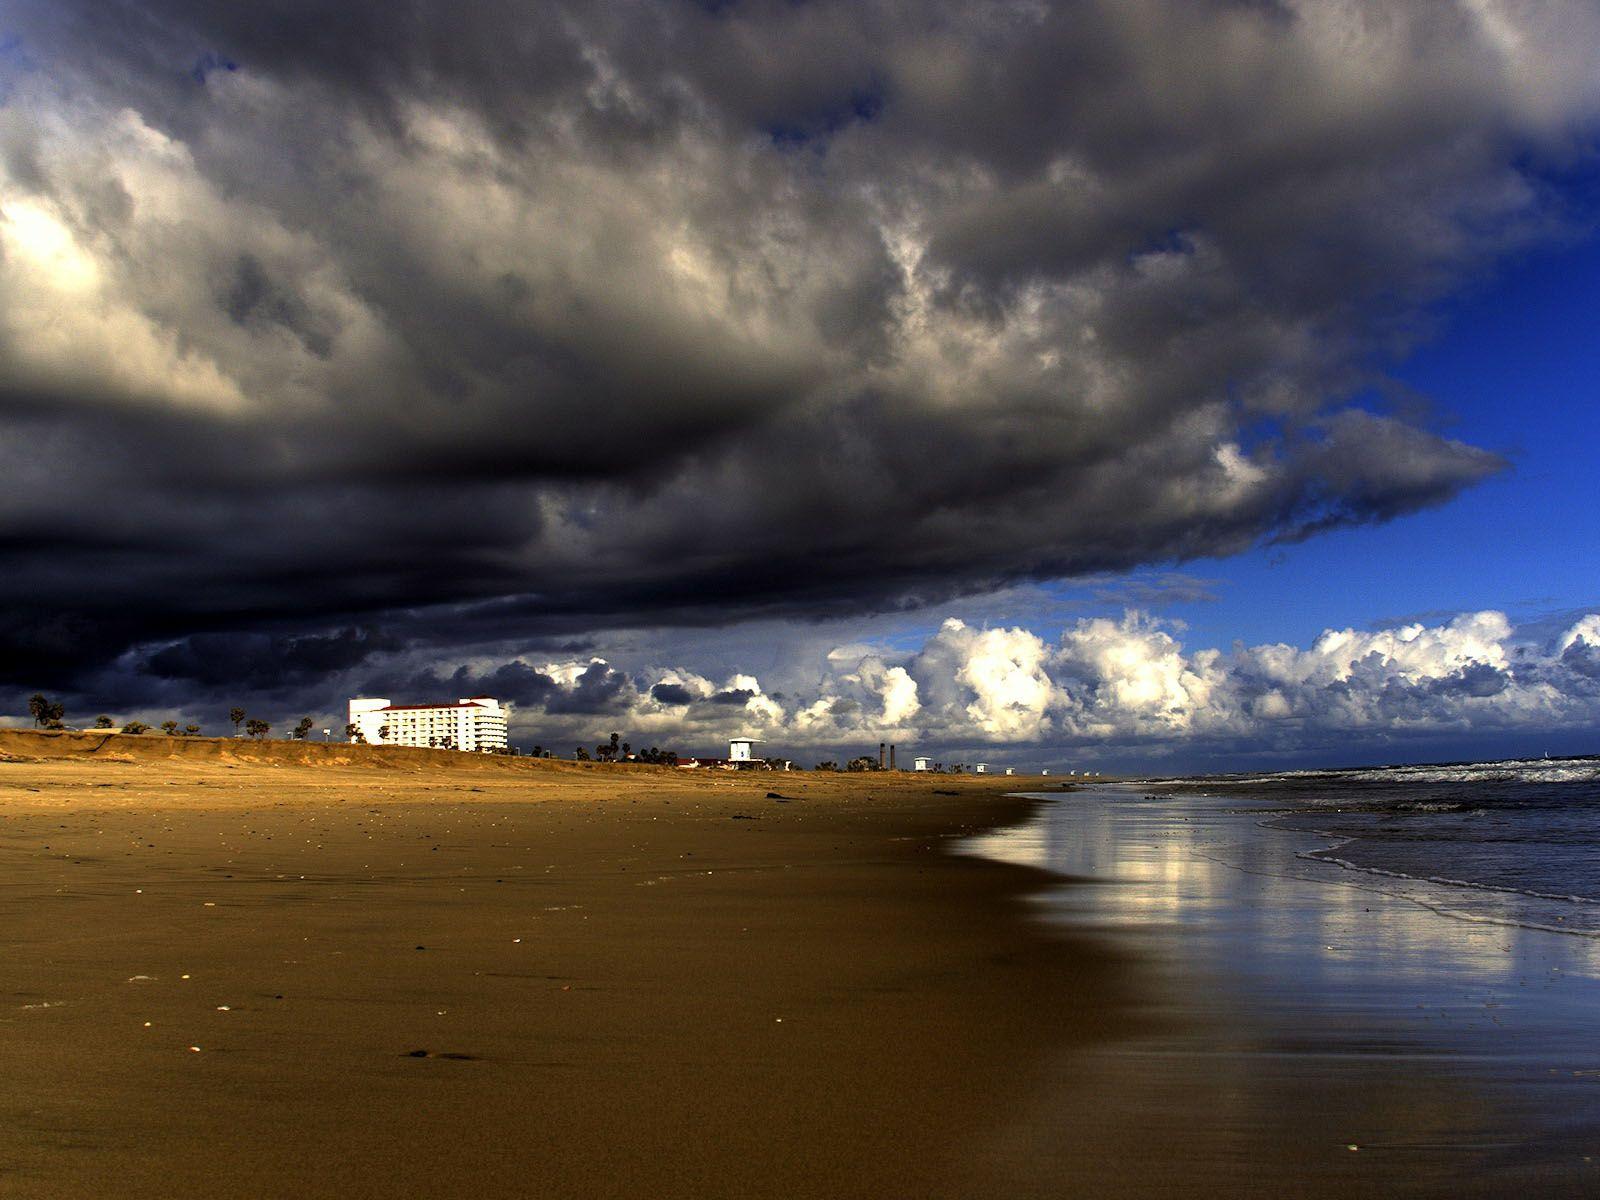 Beach Thunderstorm Wallpaper: ... Wallpaper, Apple Background Wallpapers